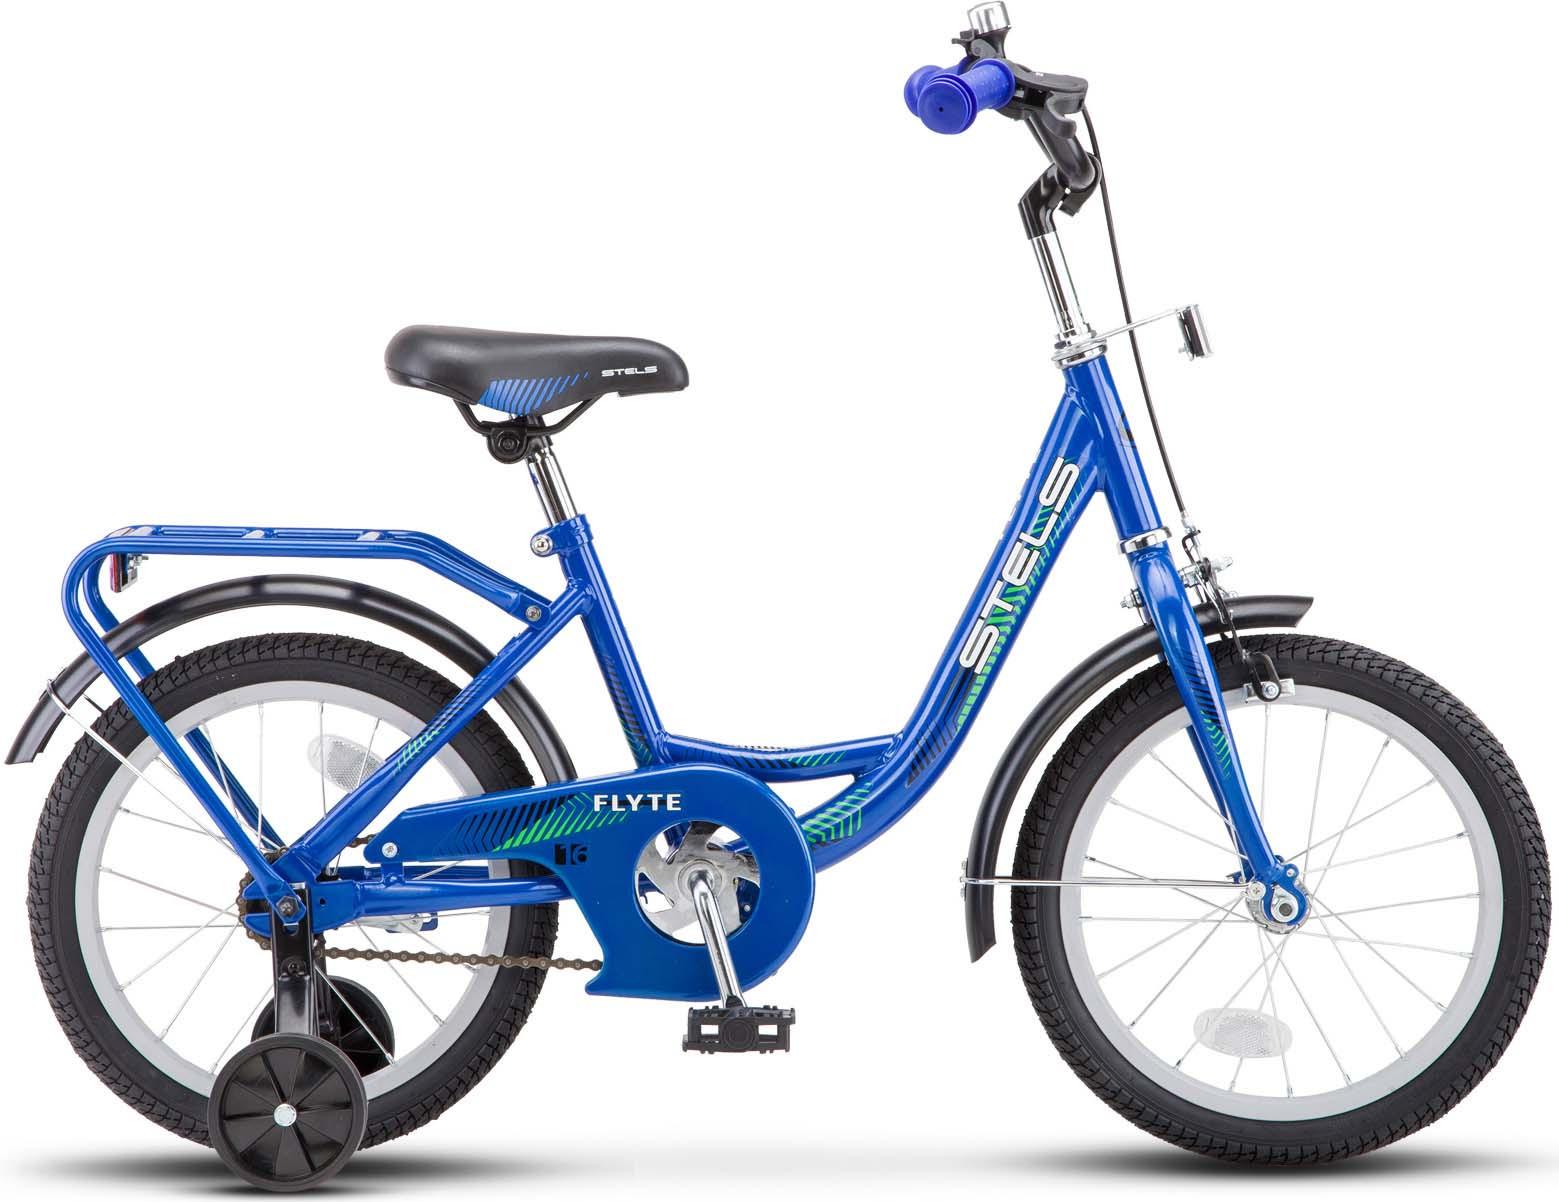 Велосипед Stels Flyte 16, JU000191922018, синий недорго, оригинальная цена